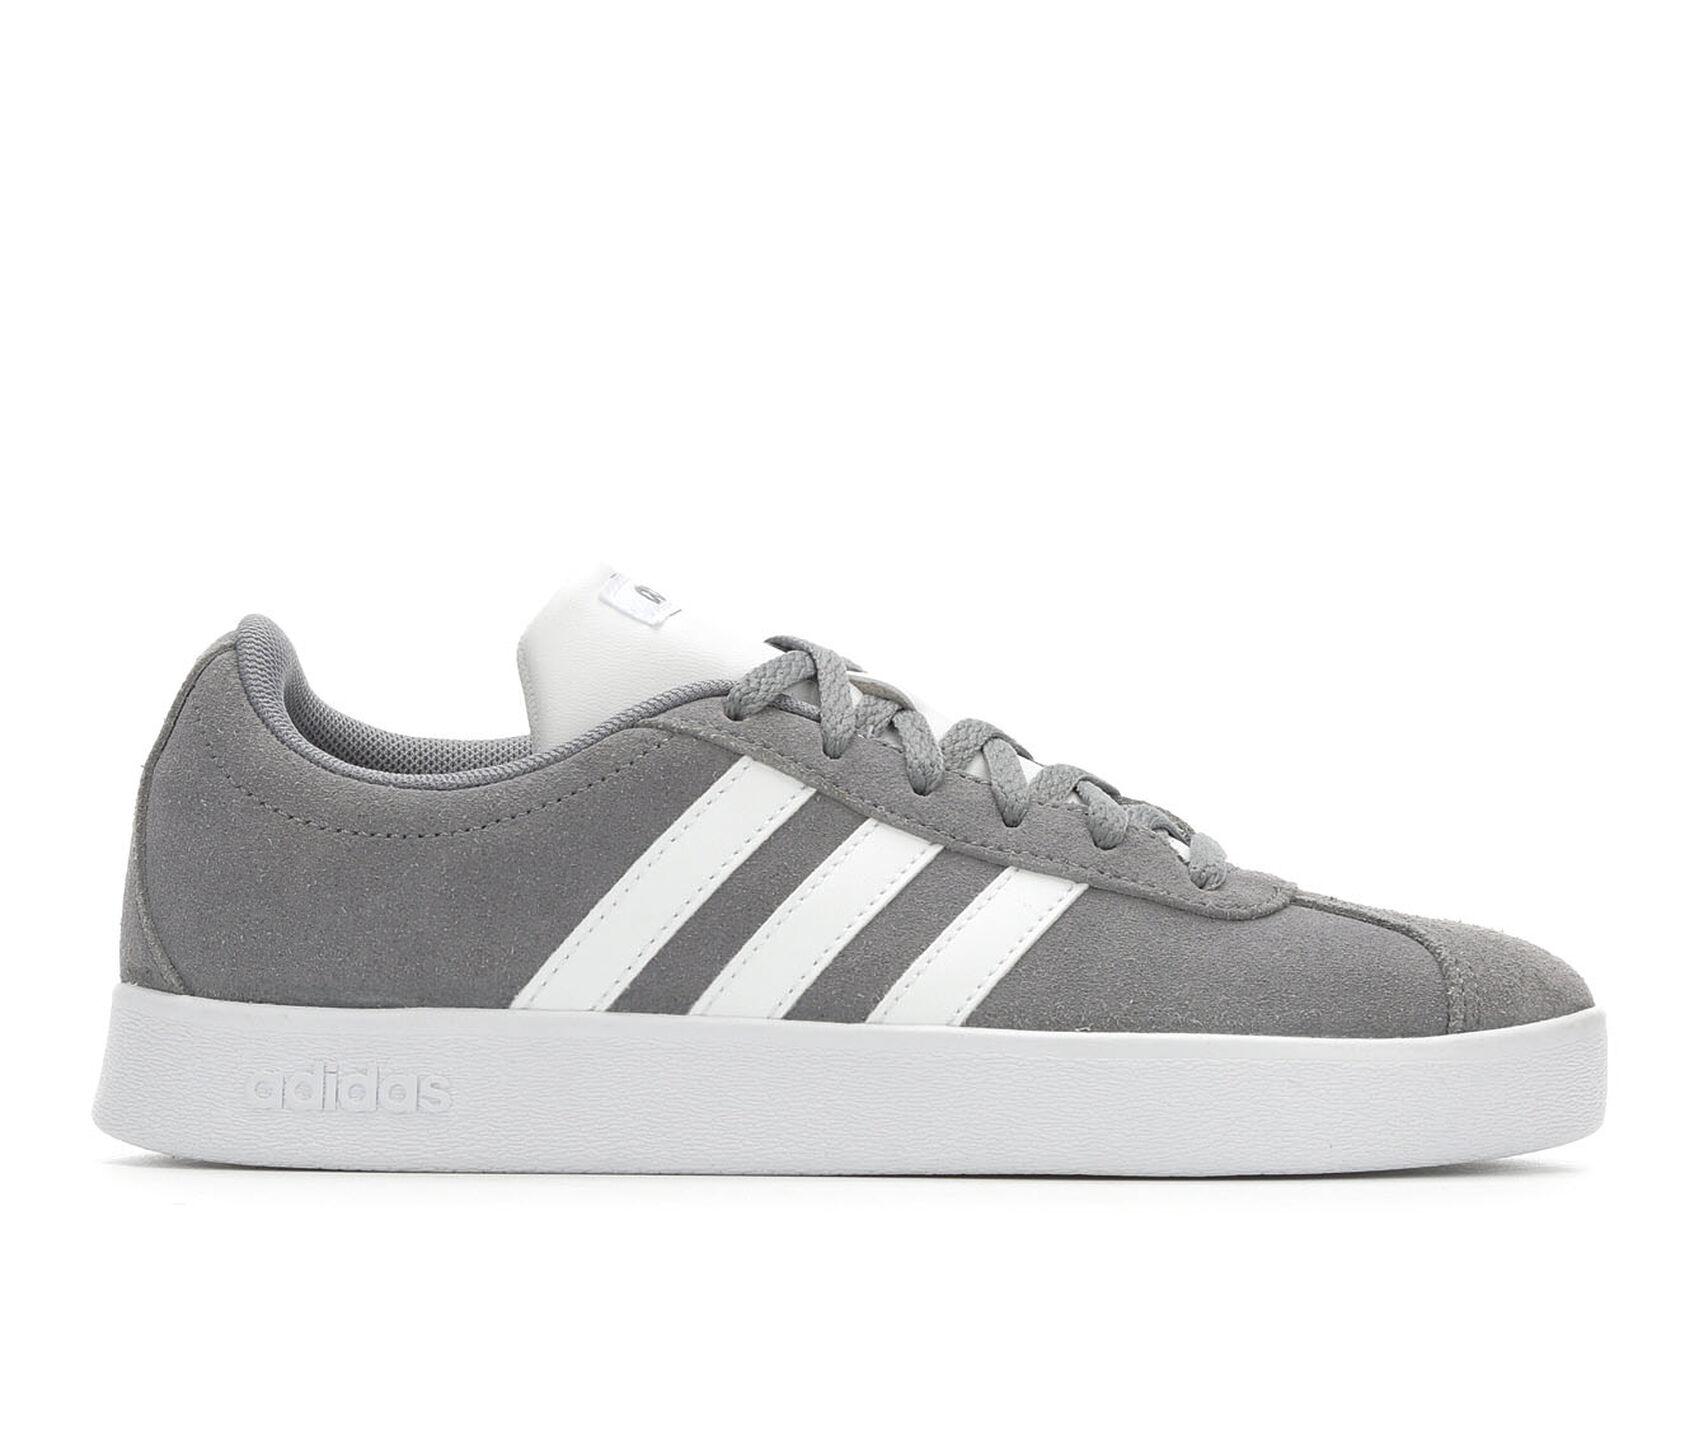 9736377eba203 Boys' Adidas Little Kid & Big Kid VL Court Sneakers | Shoe Carnival